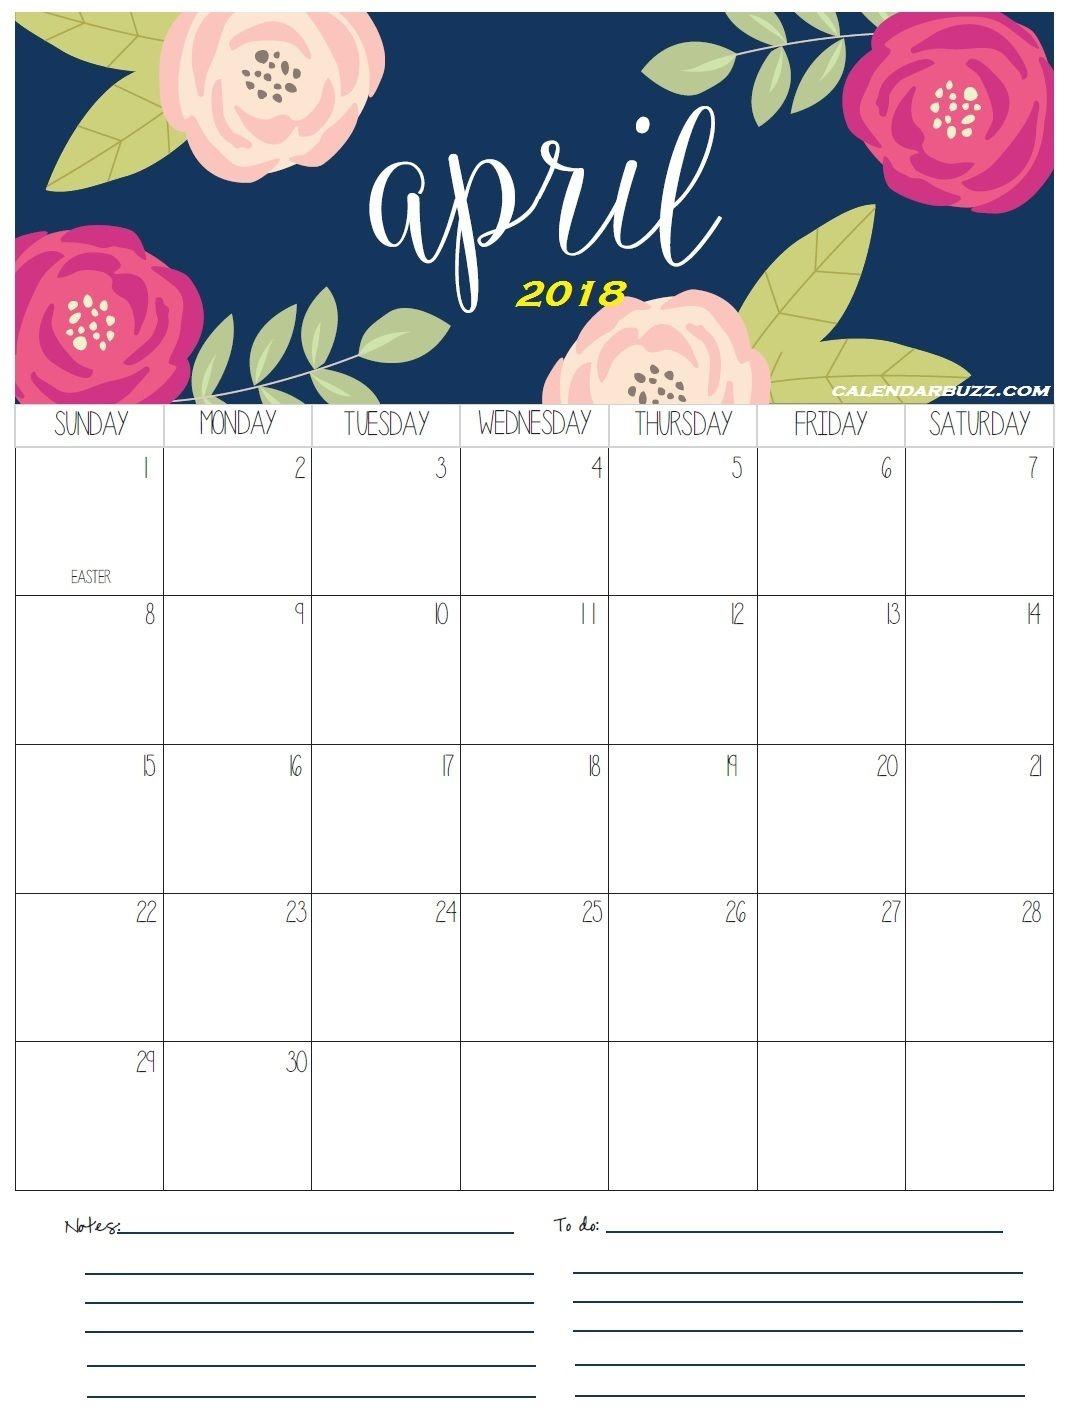 April 2018 Calendar Calendar Pinterest Holiday Calendar  Xjb